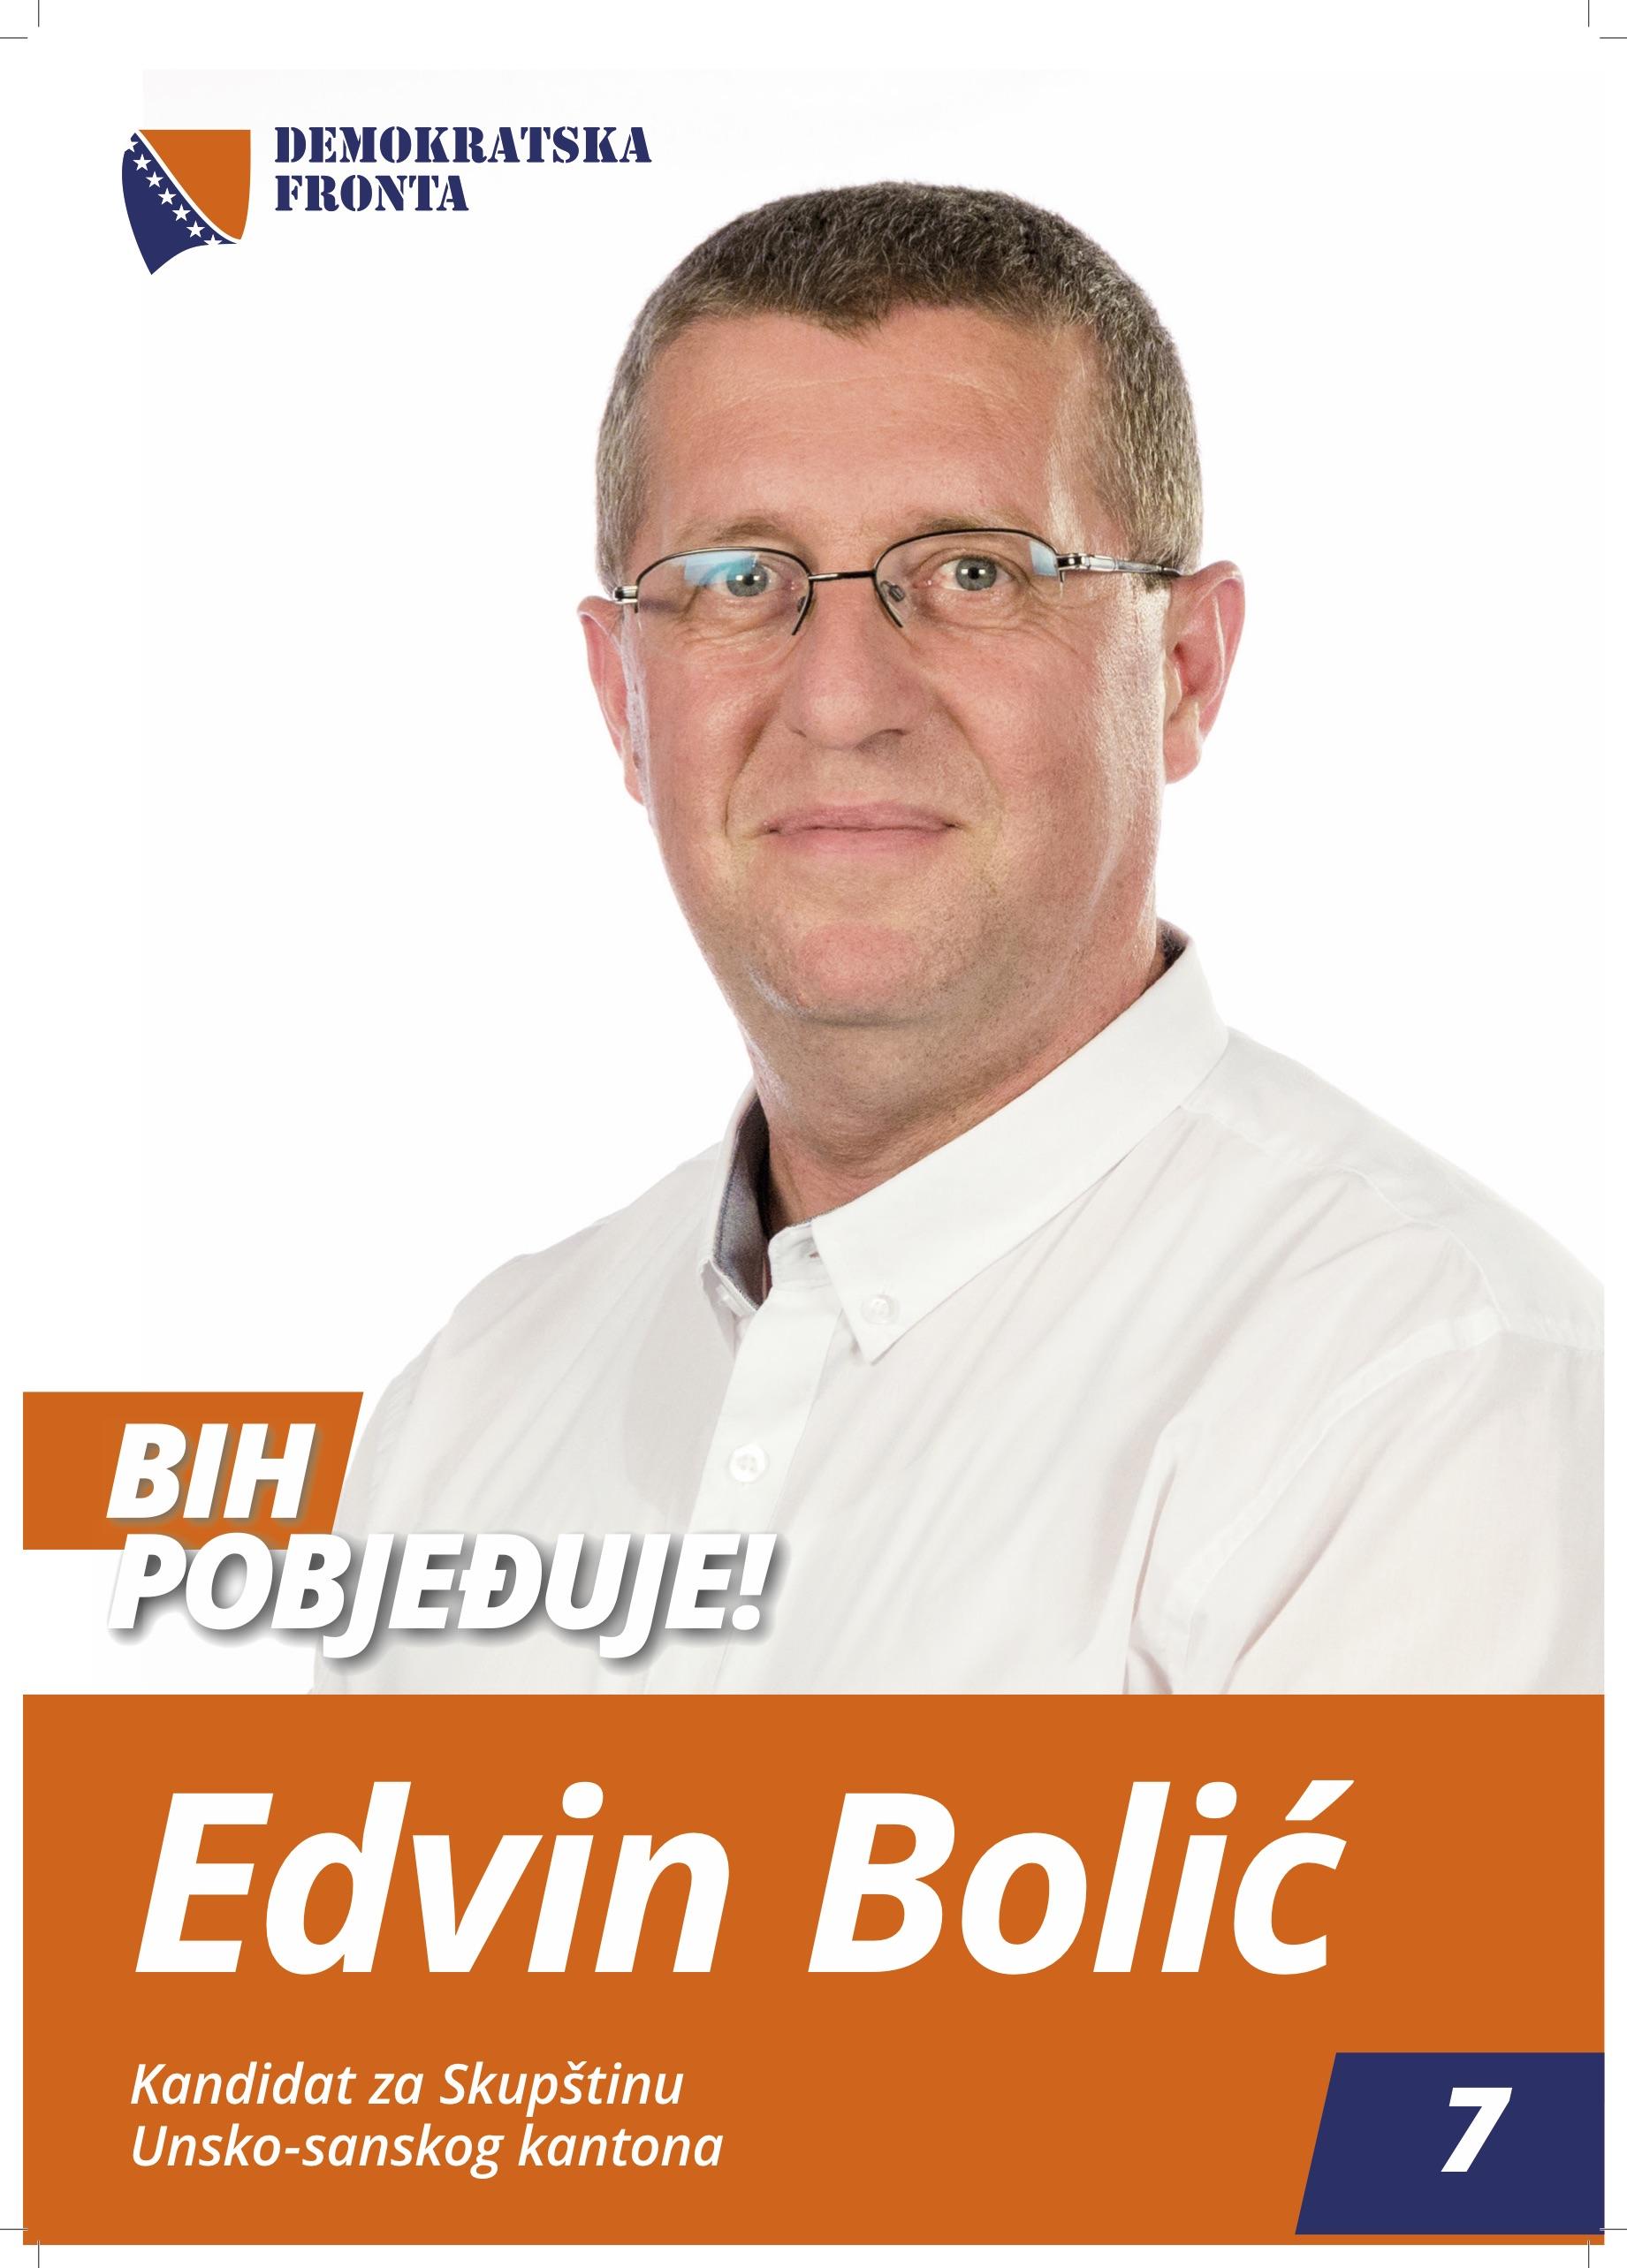 Edvin Bolić, magistar građevine